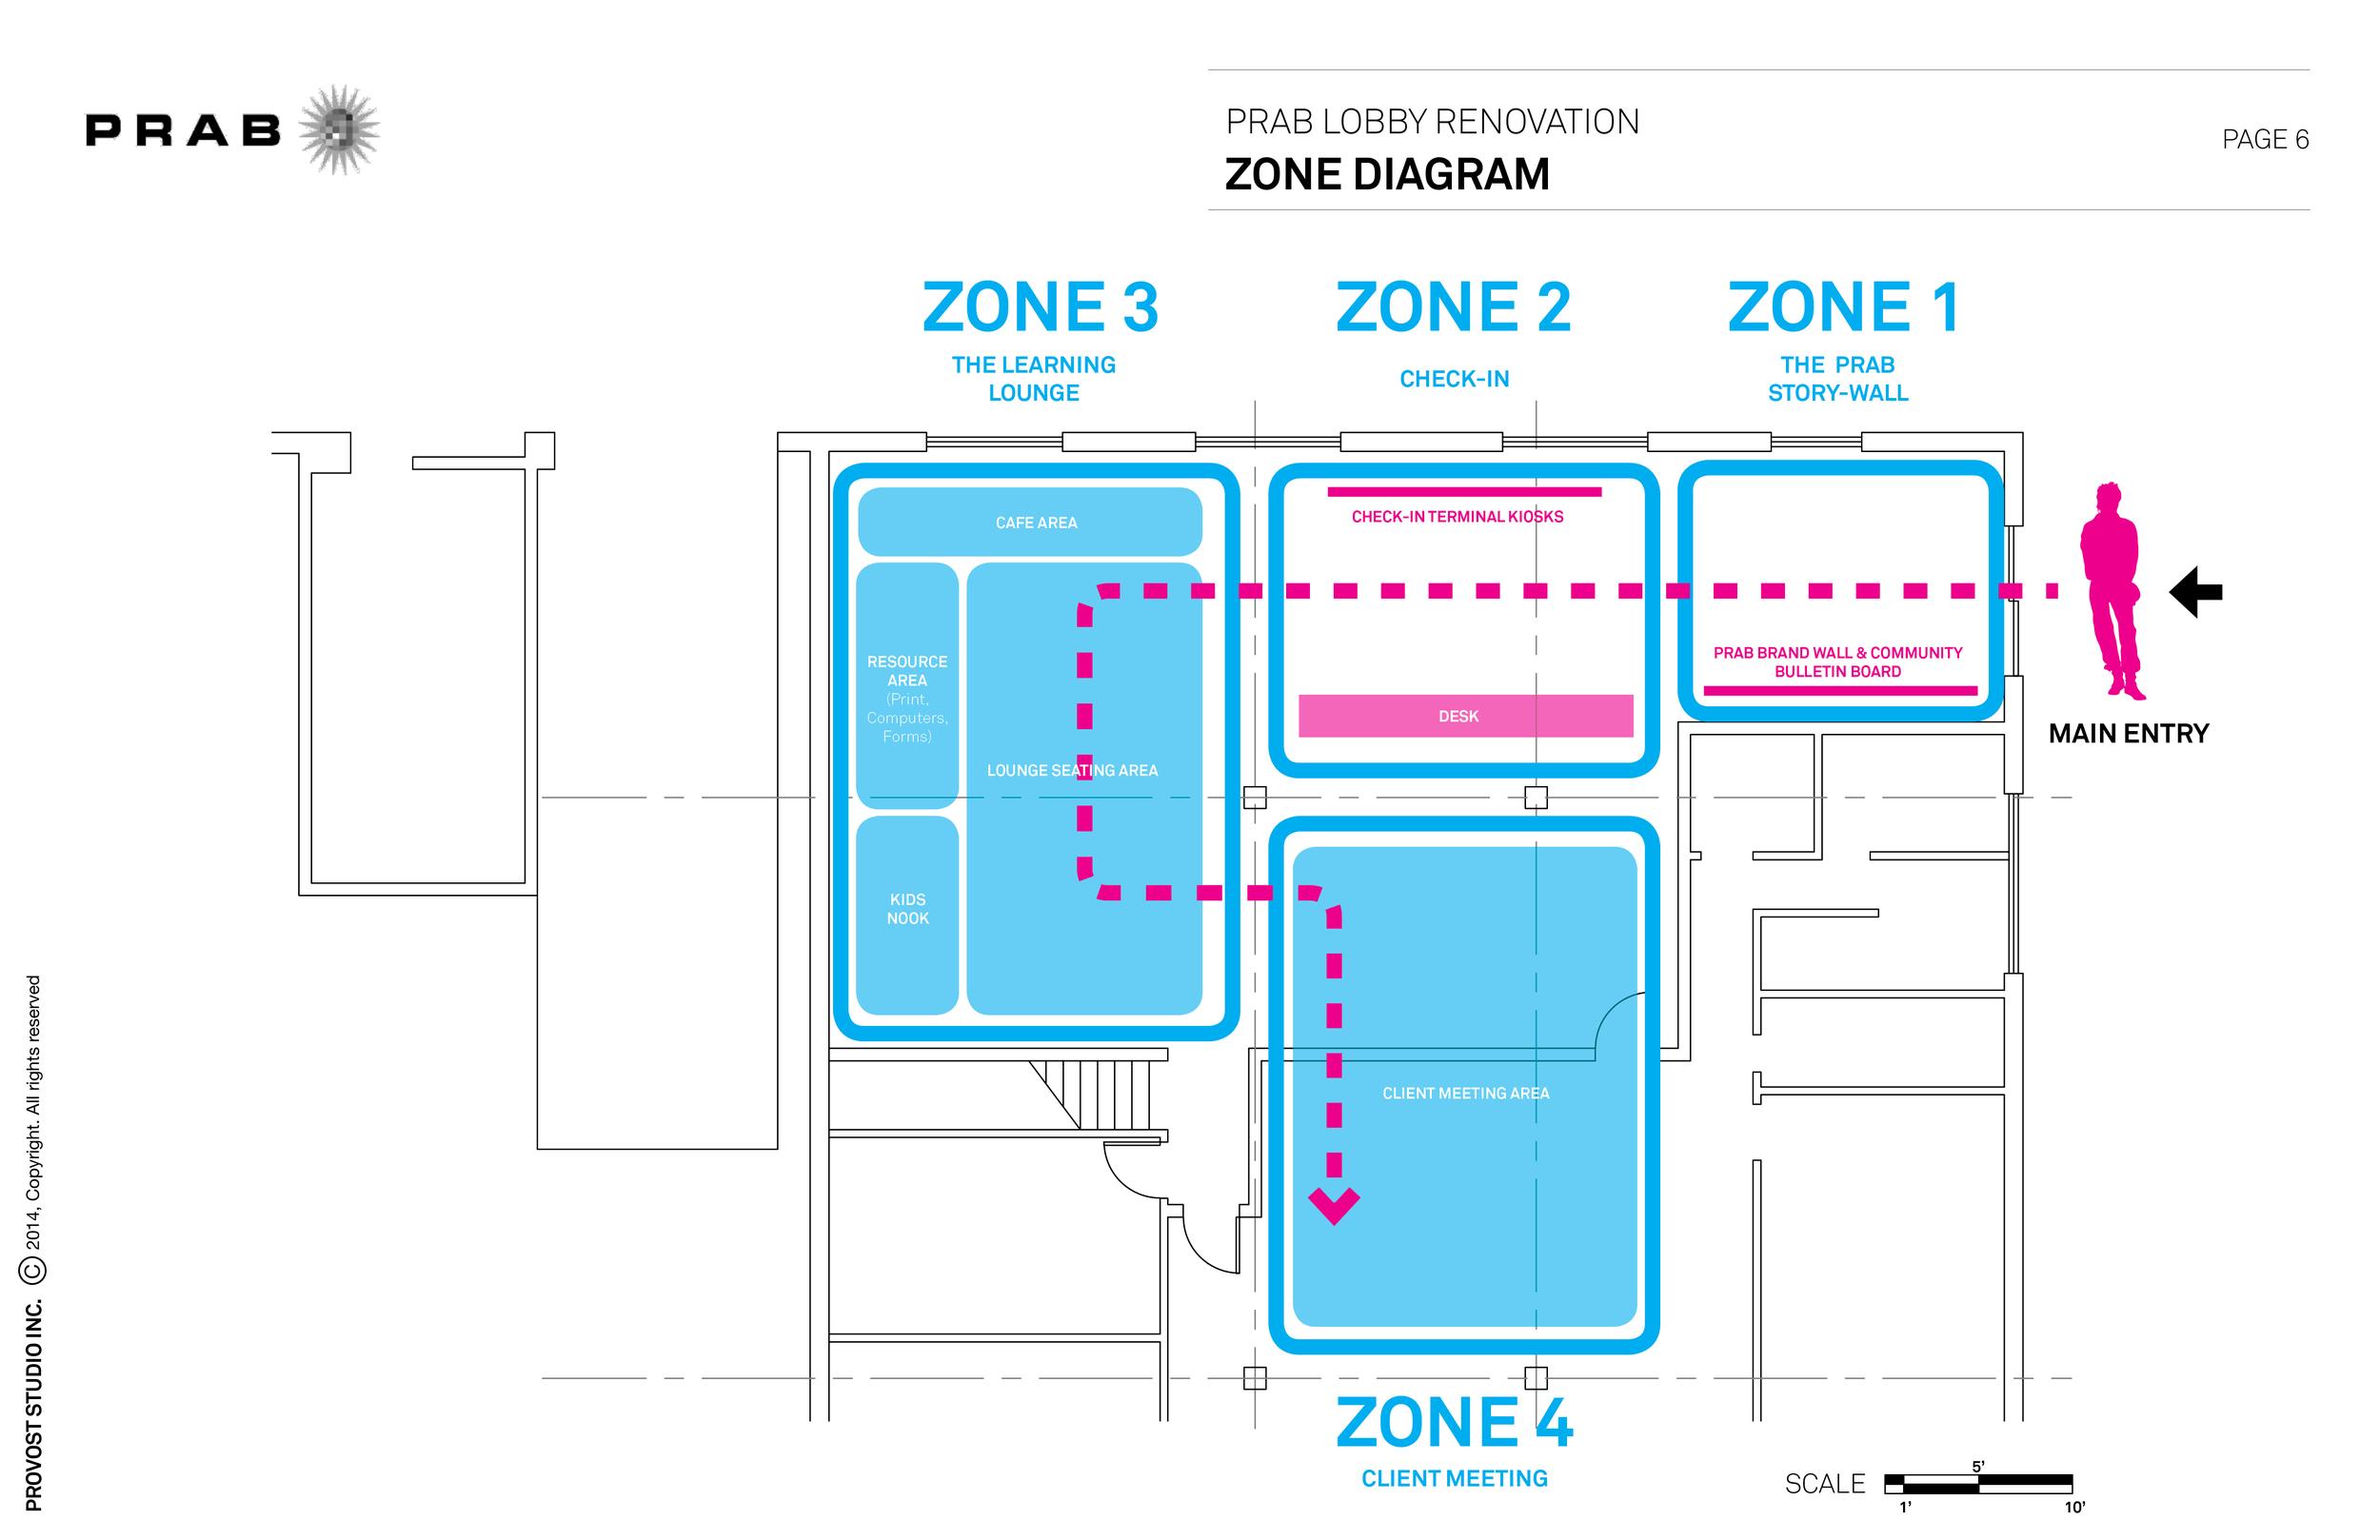 09192019_100pm_Concept Presentation_PRAB_Lobby Renovation6.jpg